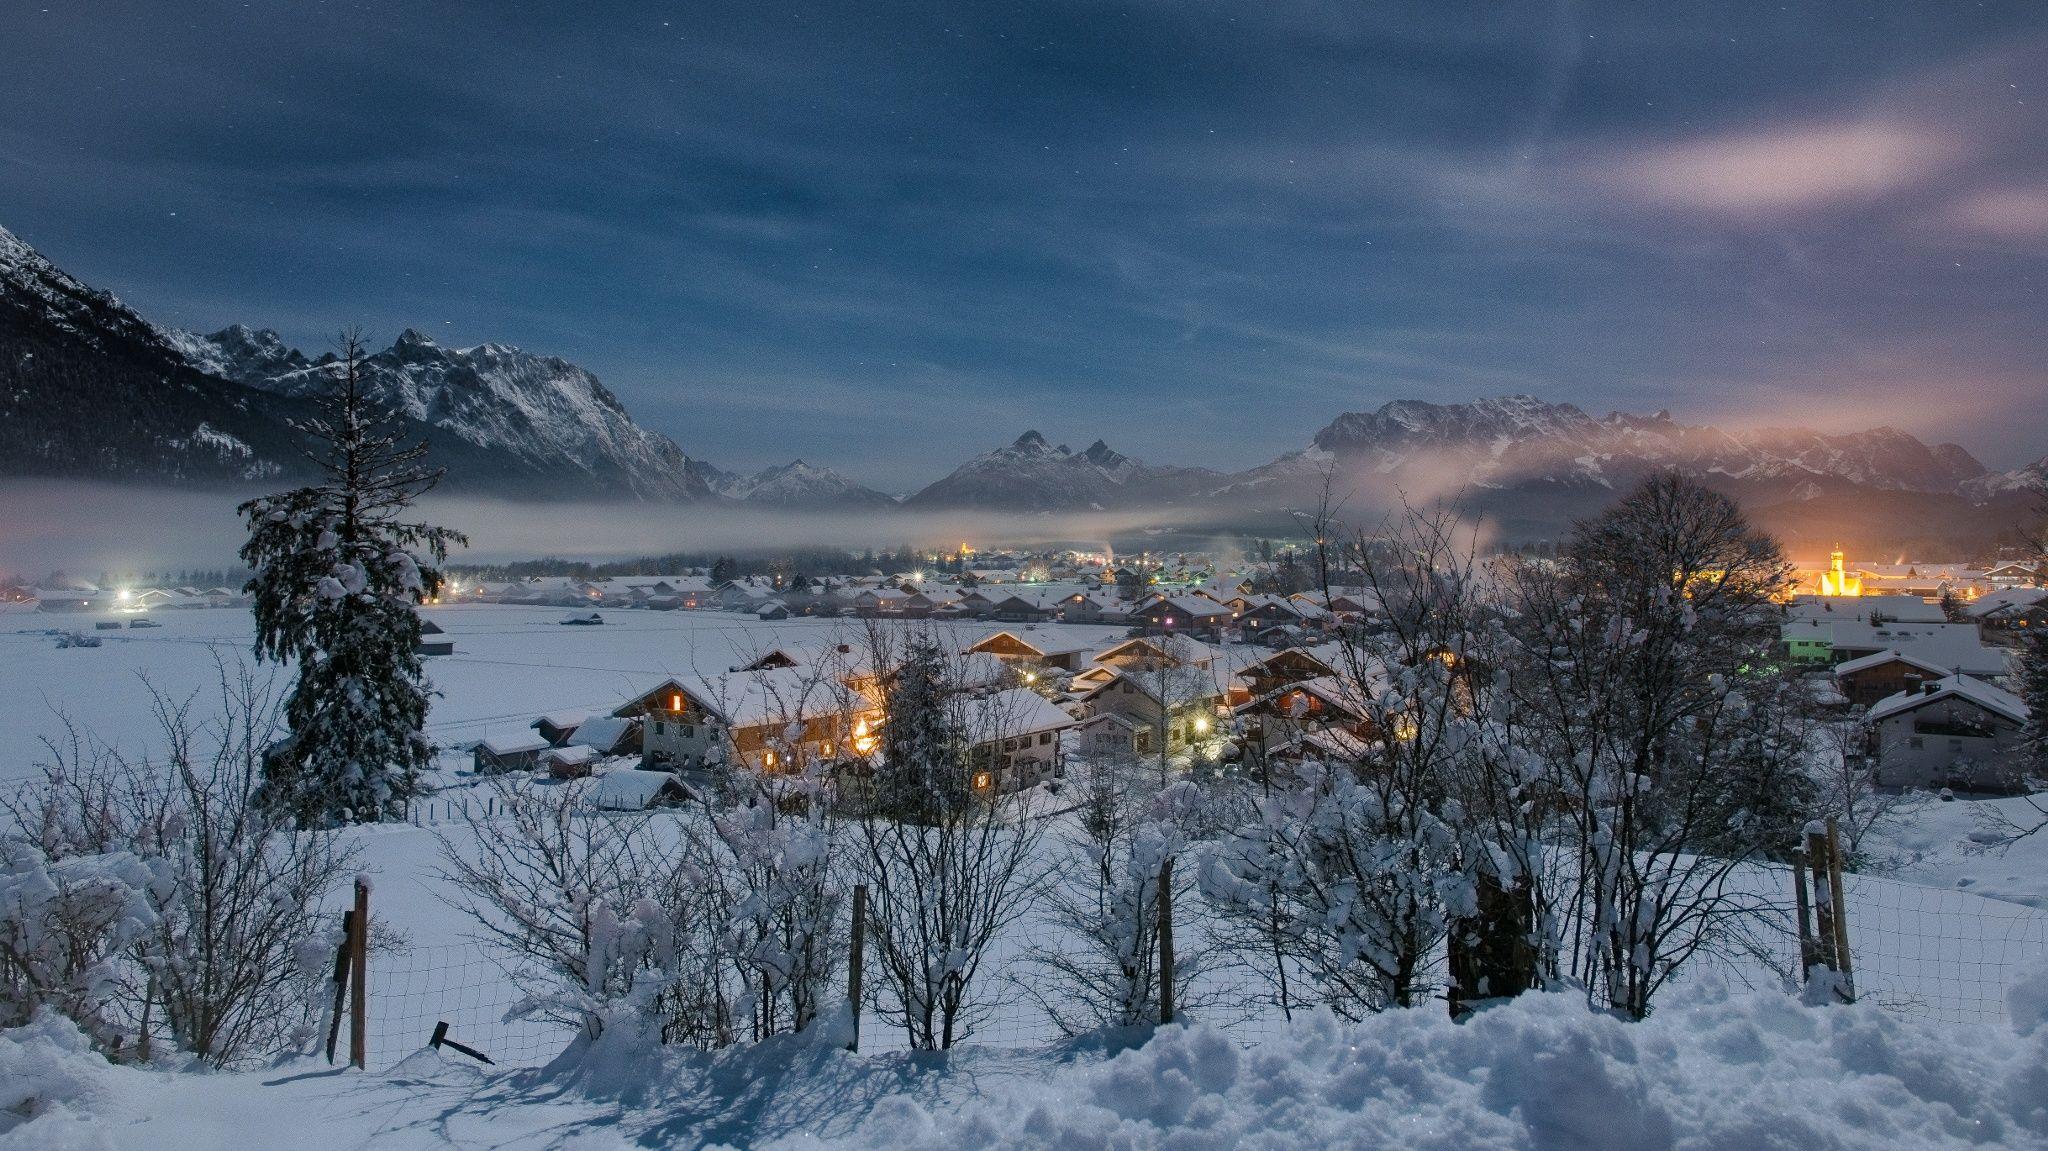 Winternight's by Andreas Kleucker on 500px